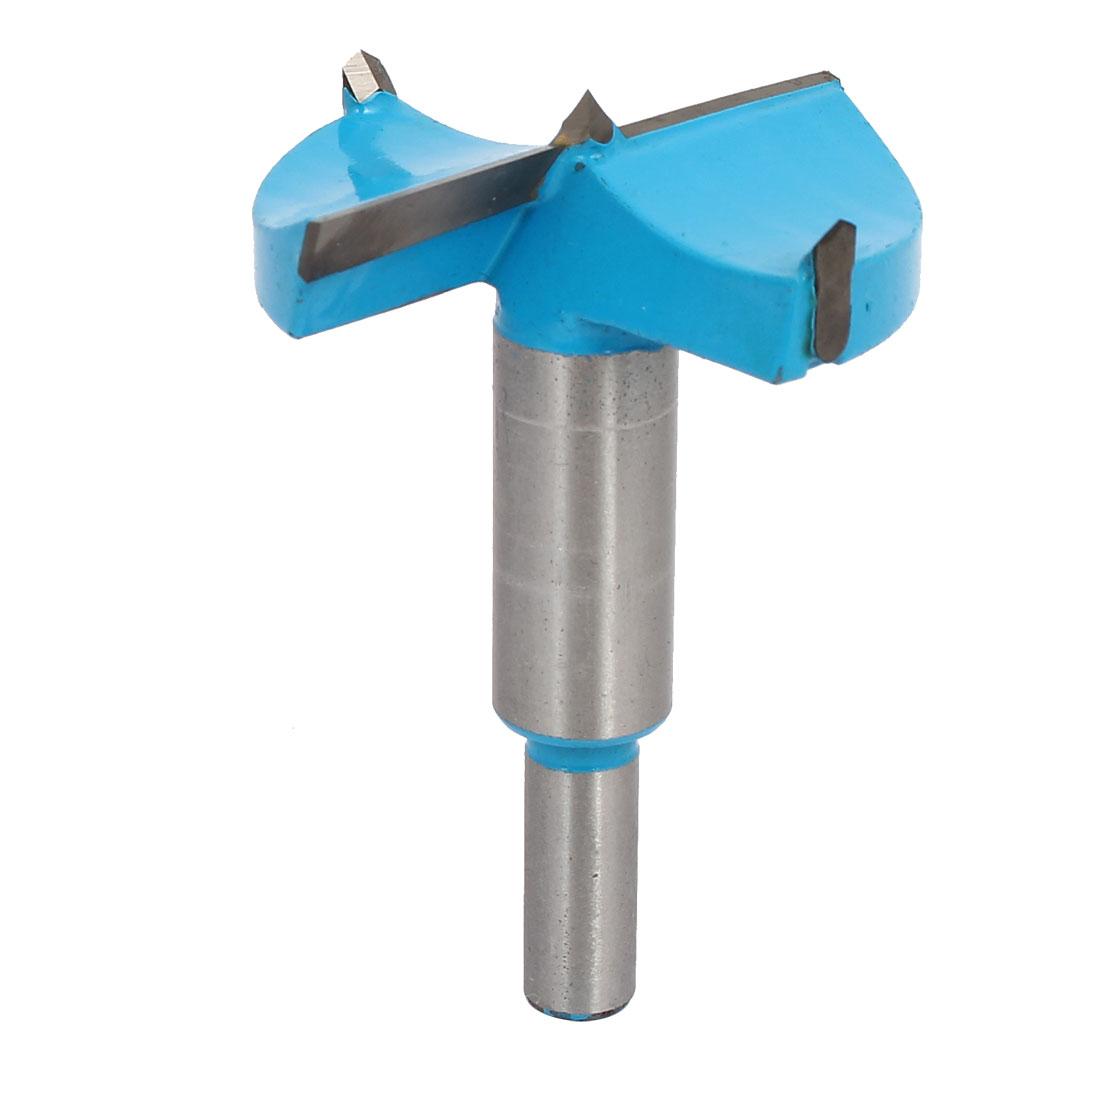 55mm Cutting Dia 9.5mm Round Shank Hinge Boring Drill Bit Wood Cuting Tool